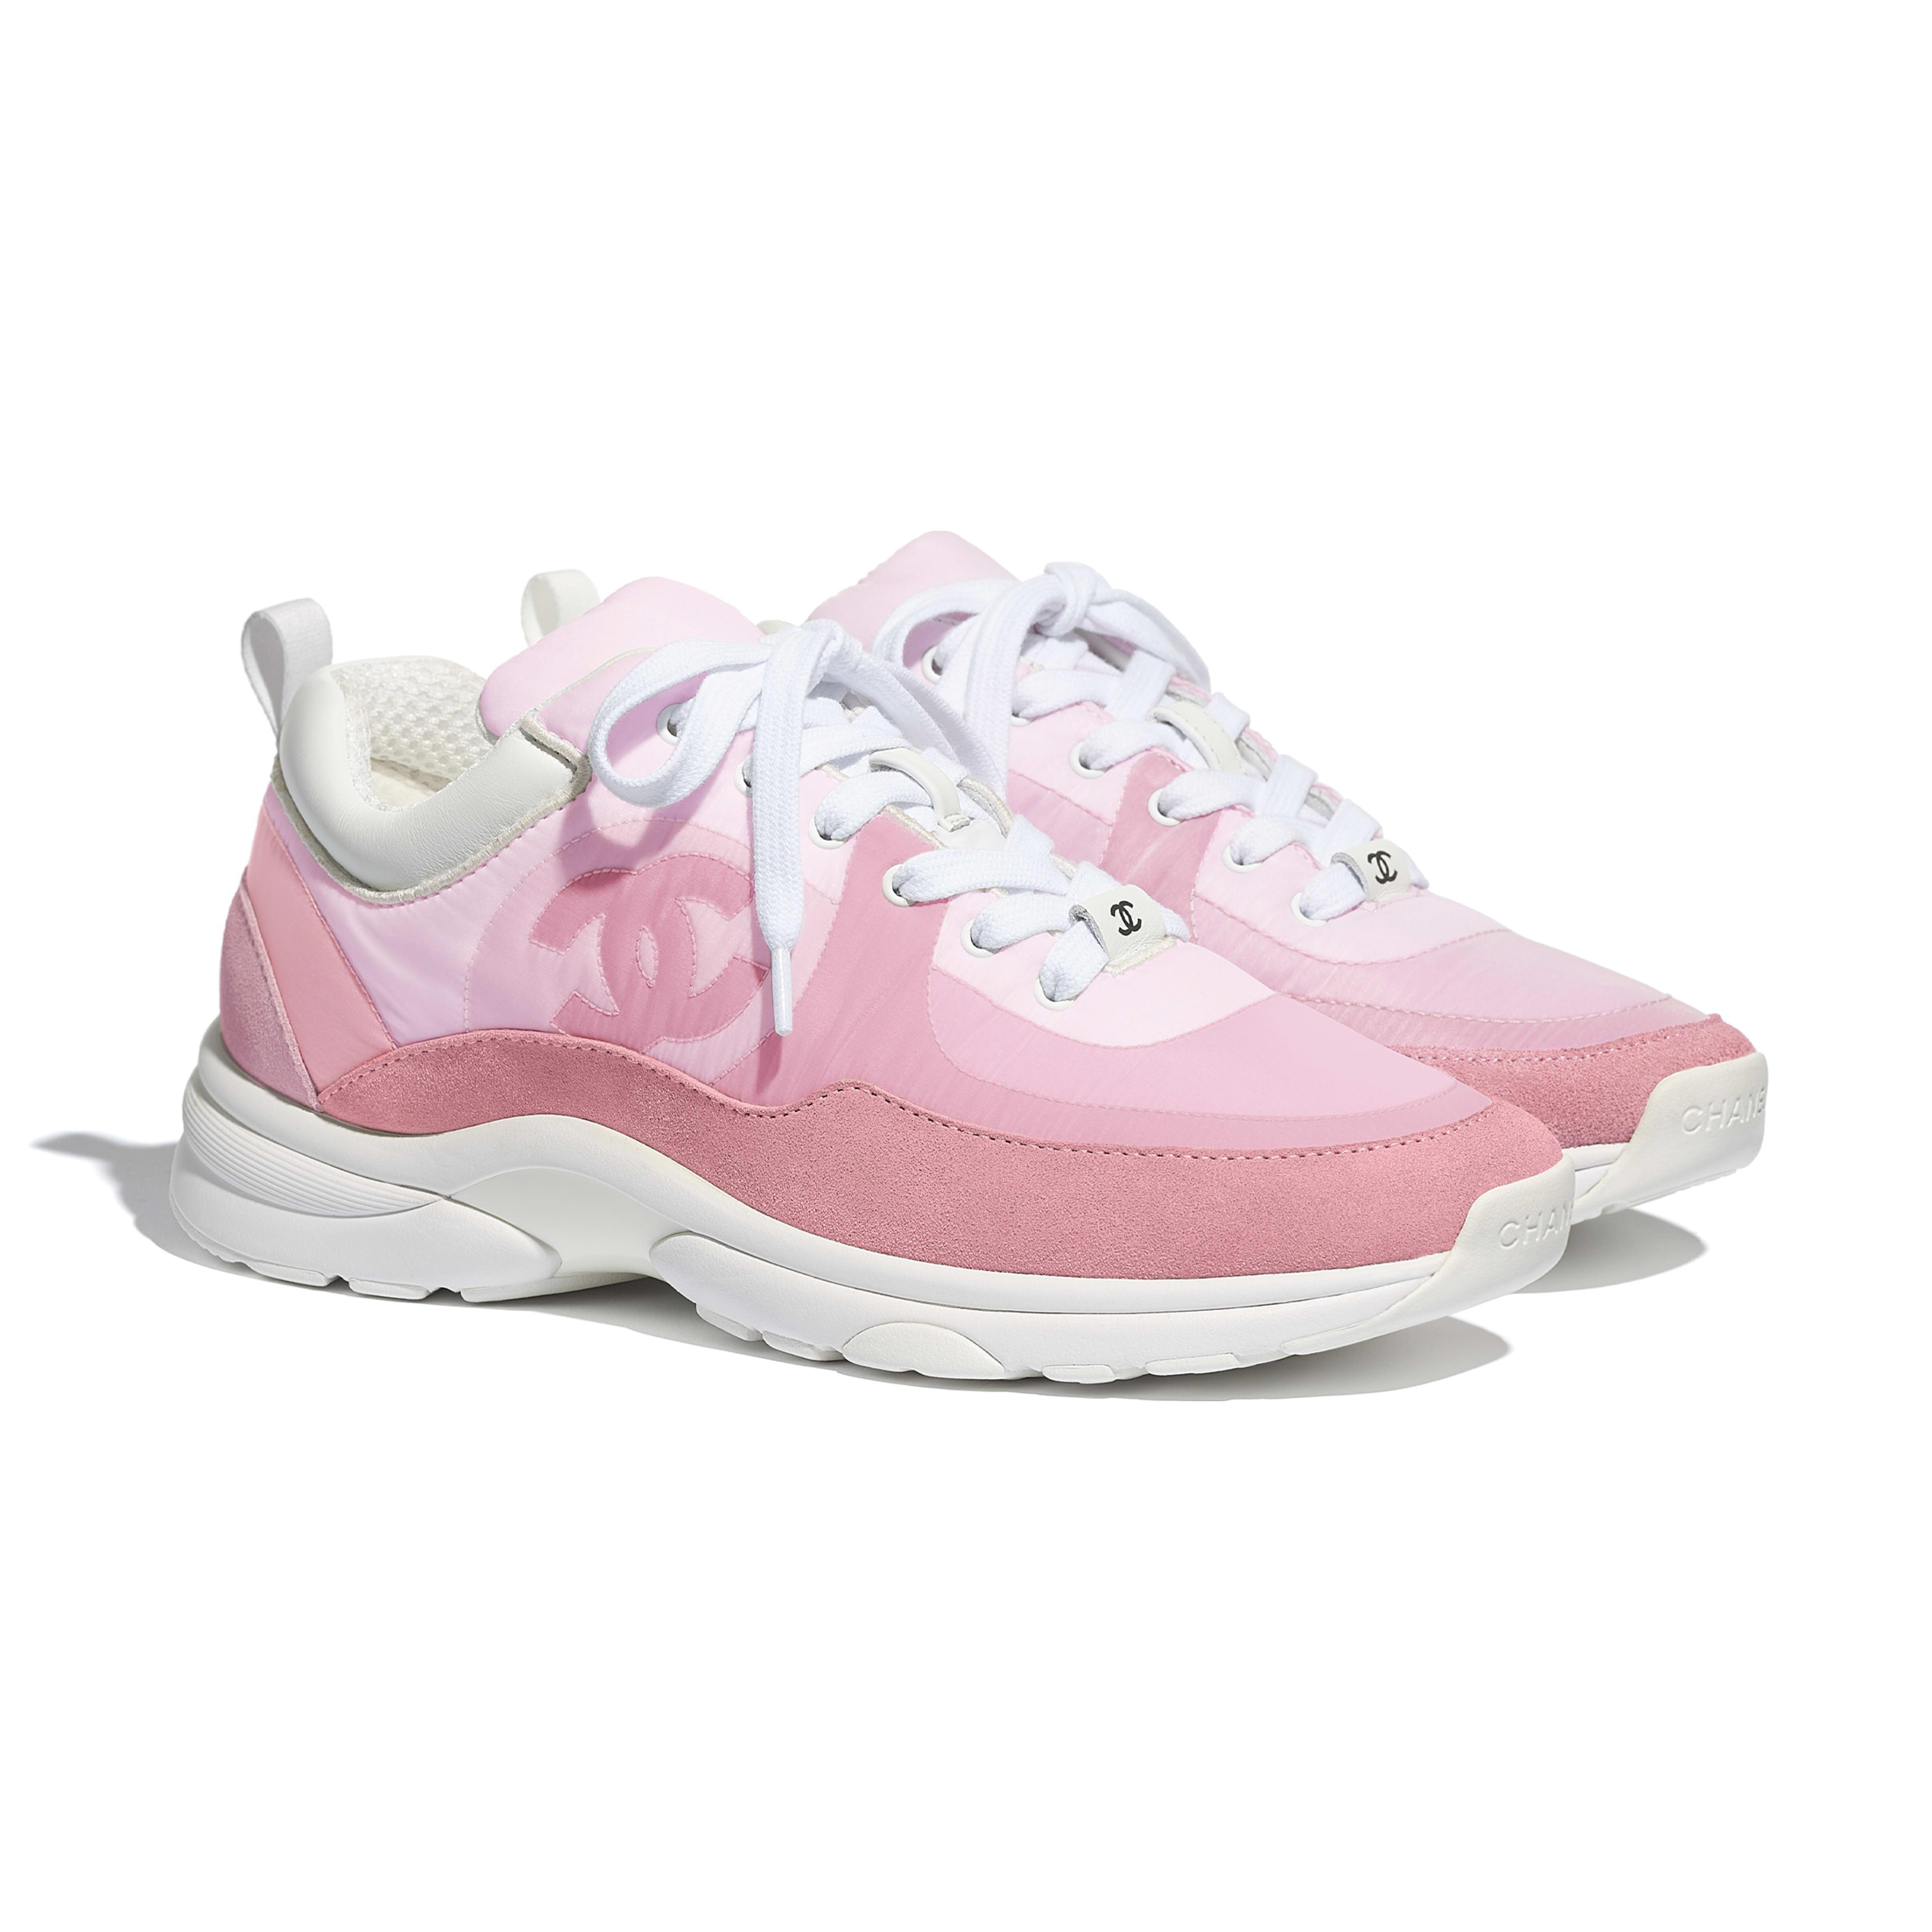 Suede Calfskin \u0026 Nylon Pale Pink